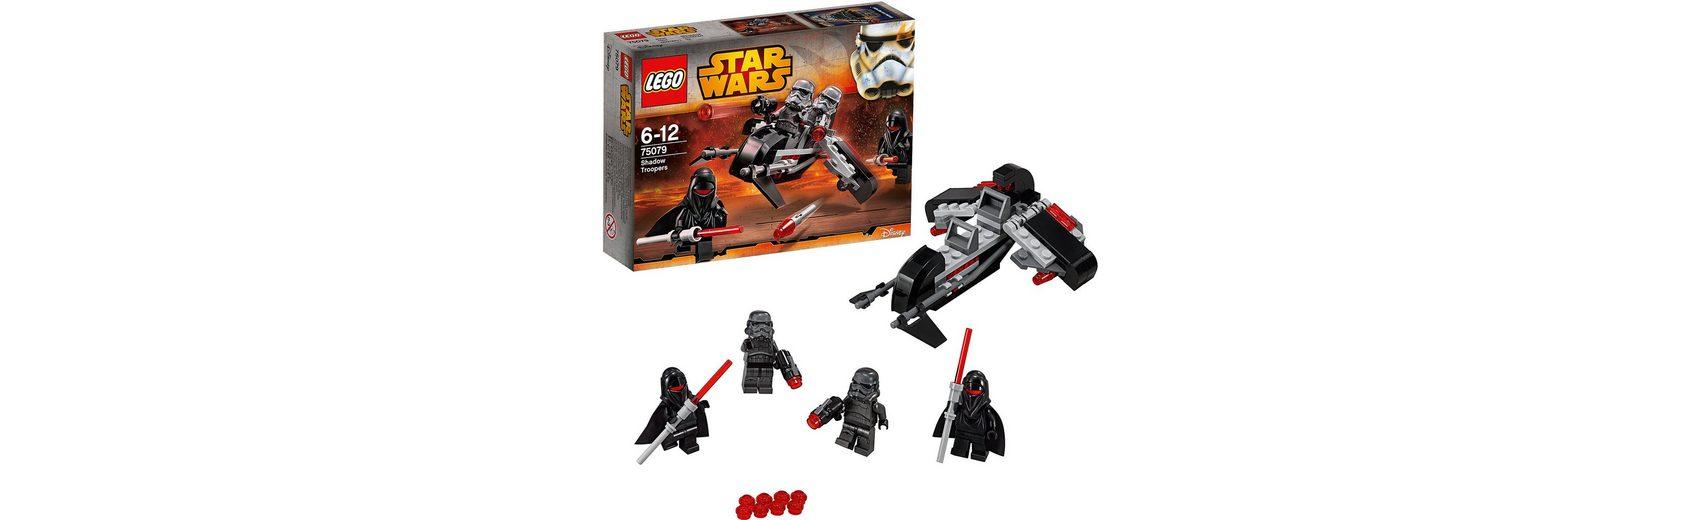 LEGO 75079 Star Wars: Shadow Troopers